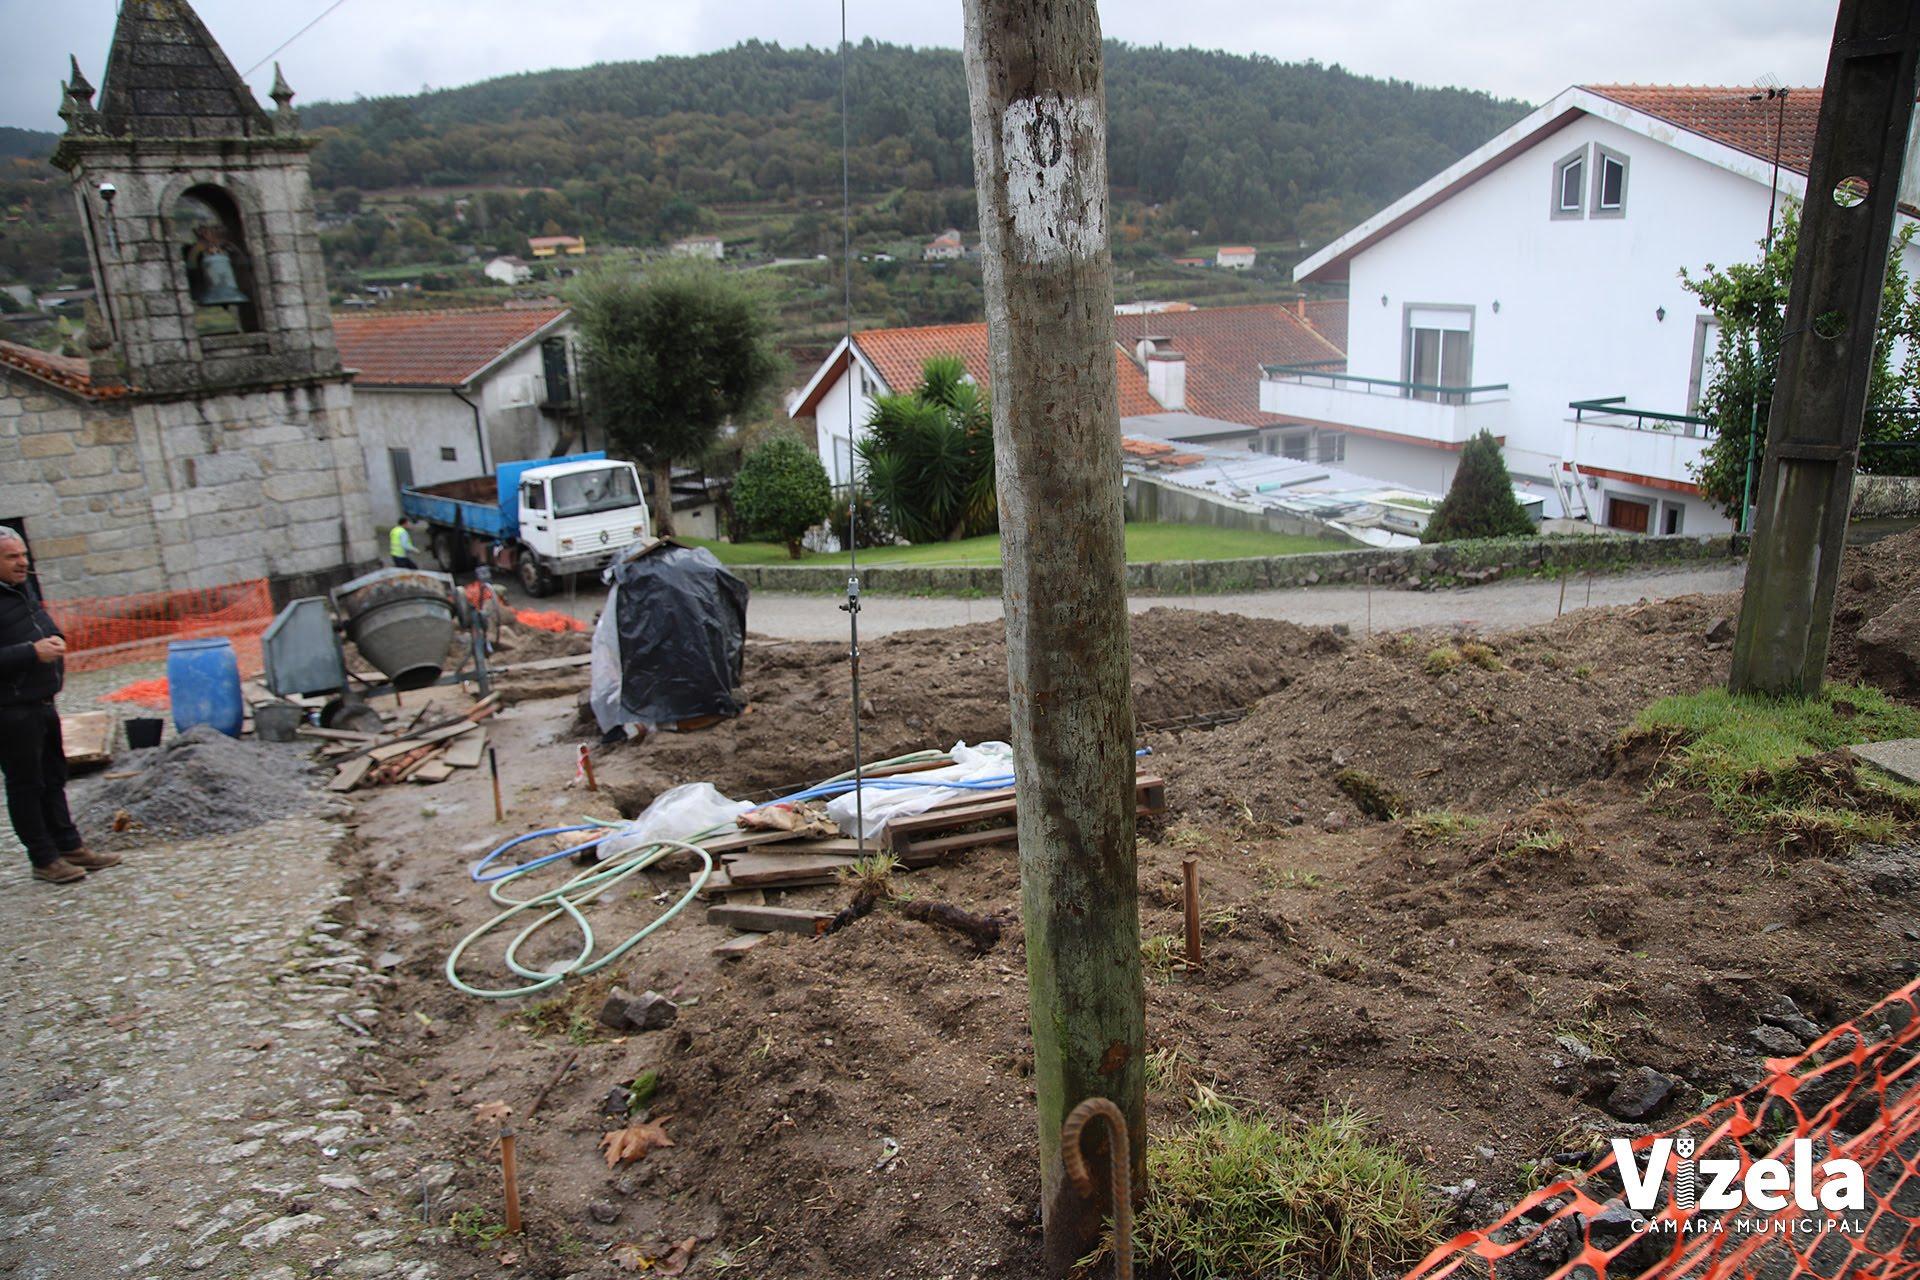 Executivo visita obras das ARUS nas freguesias